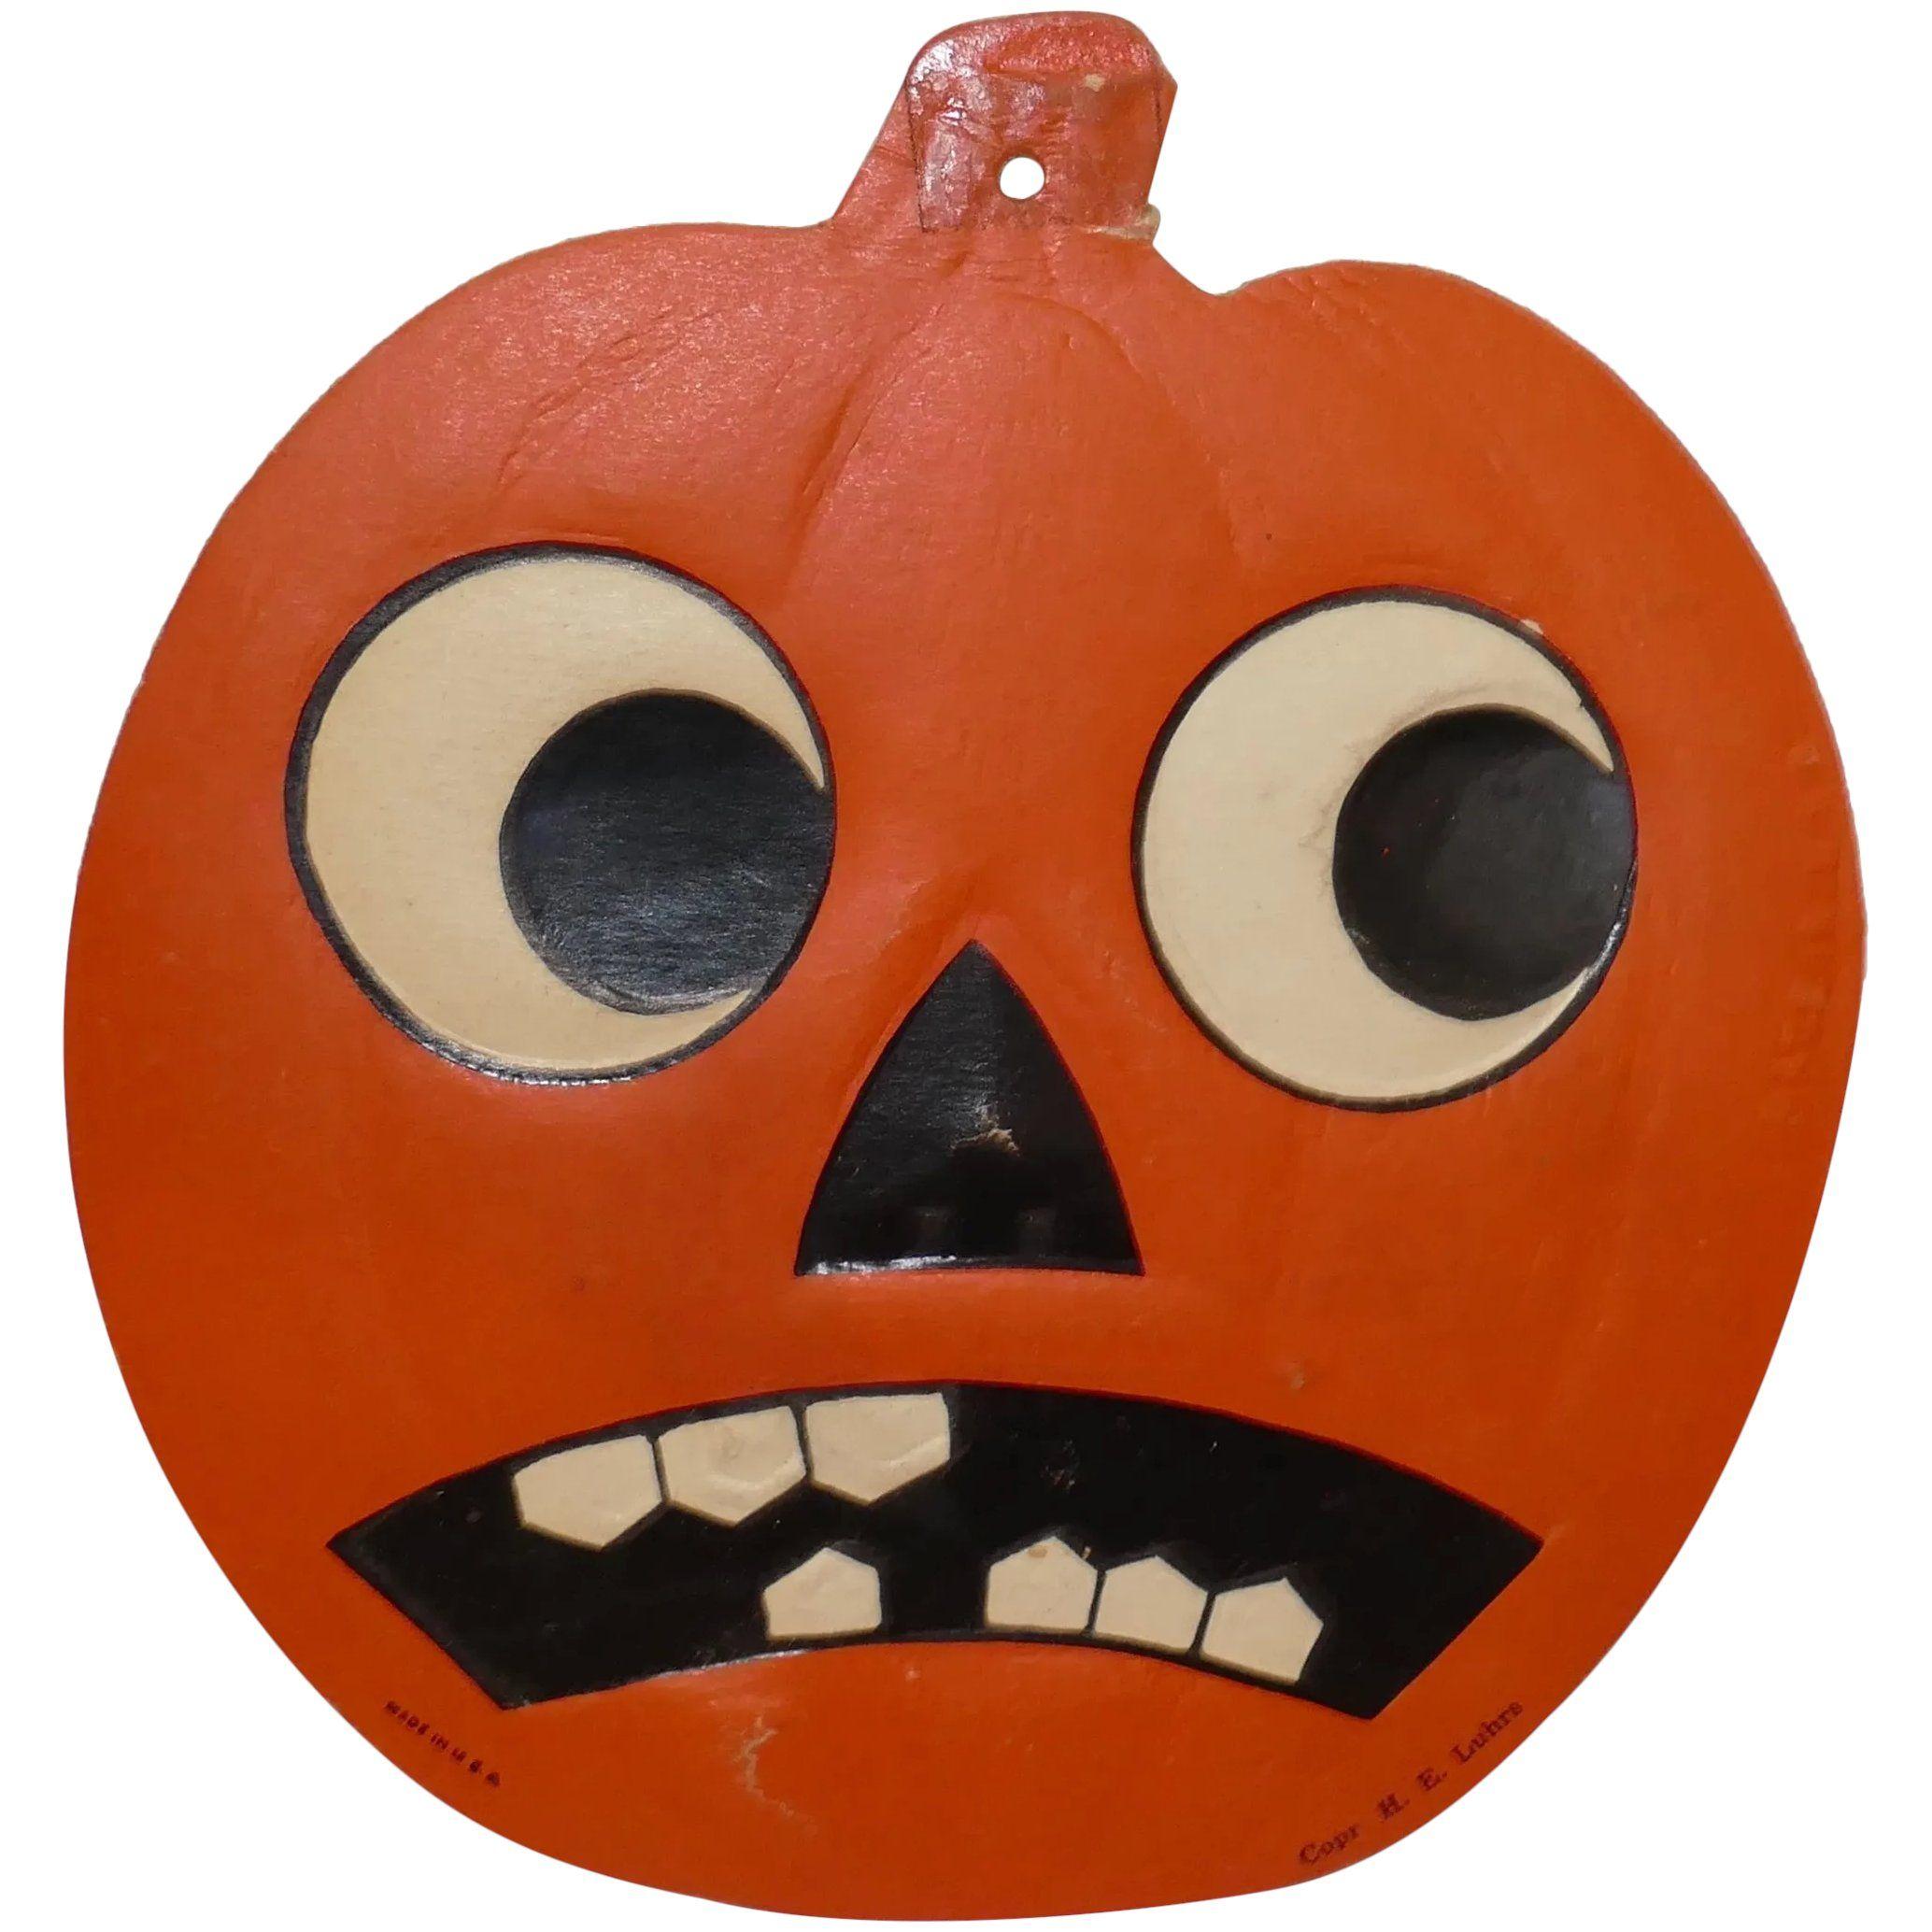 Small Size Jack O Lantern Cardboard Halloween Decoration